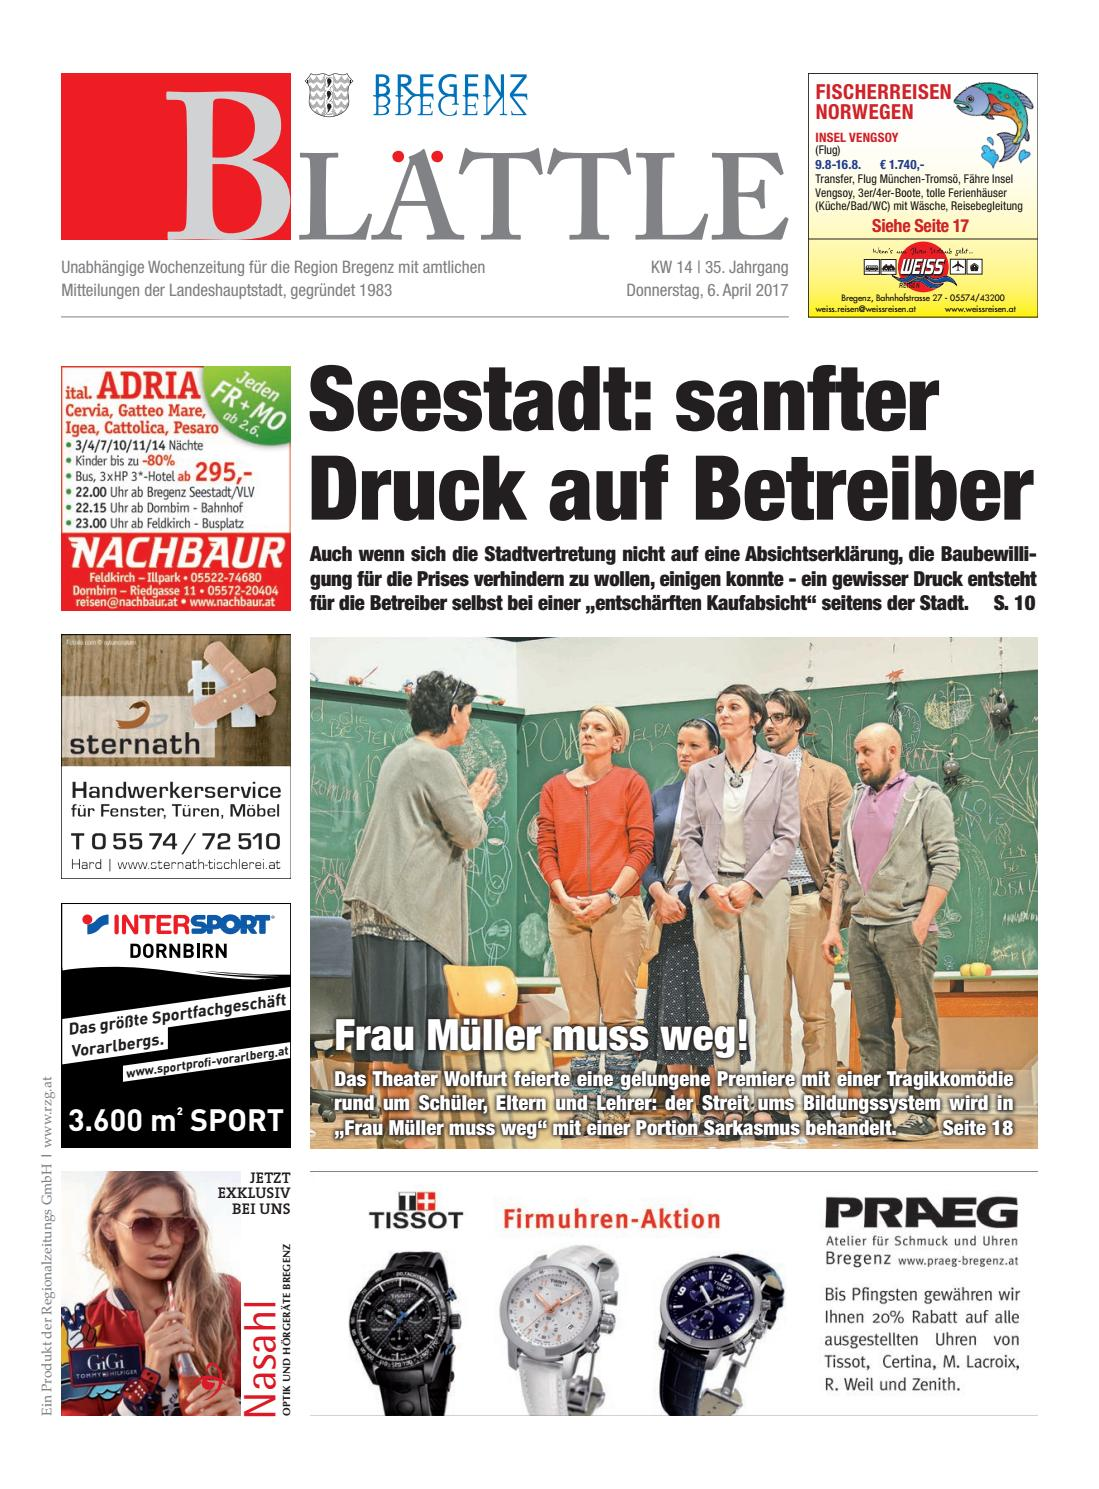 Partnersuche fr Singles in Bregenz - eDarling